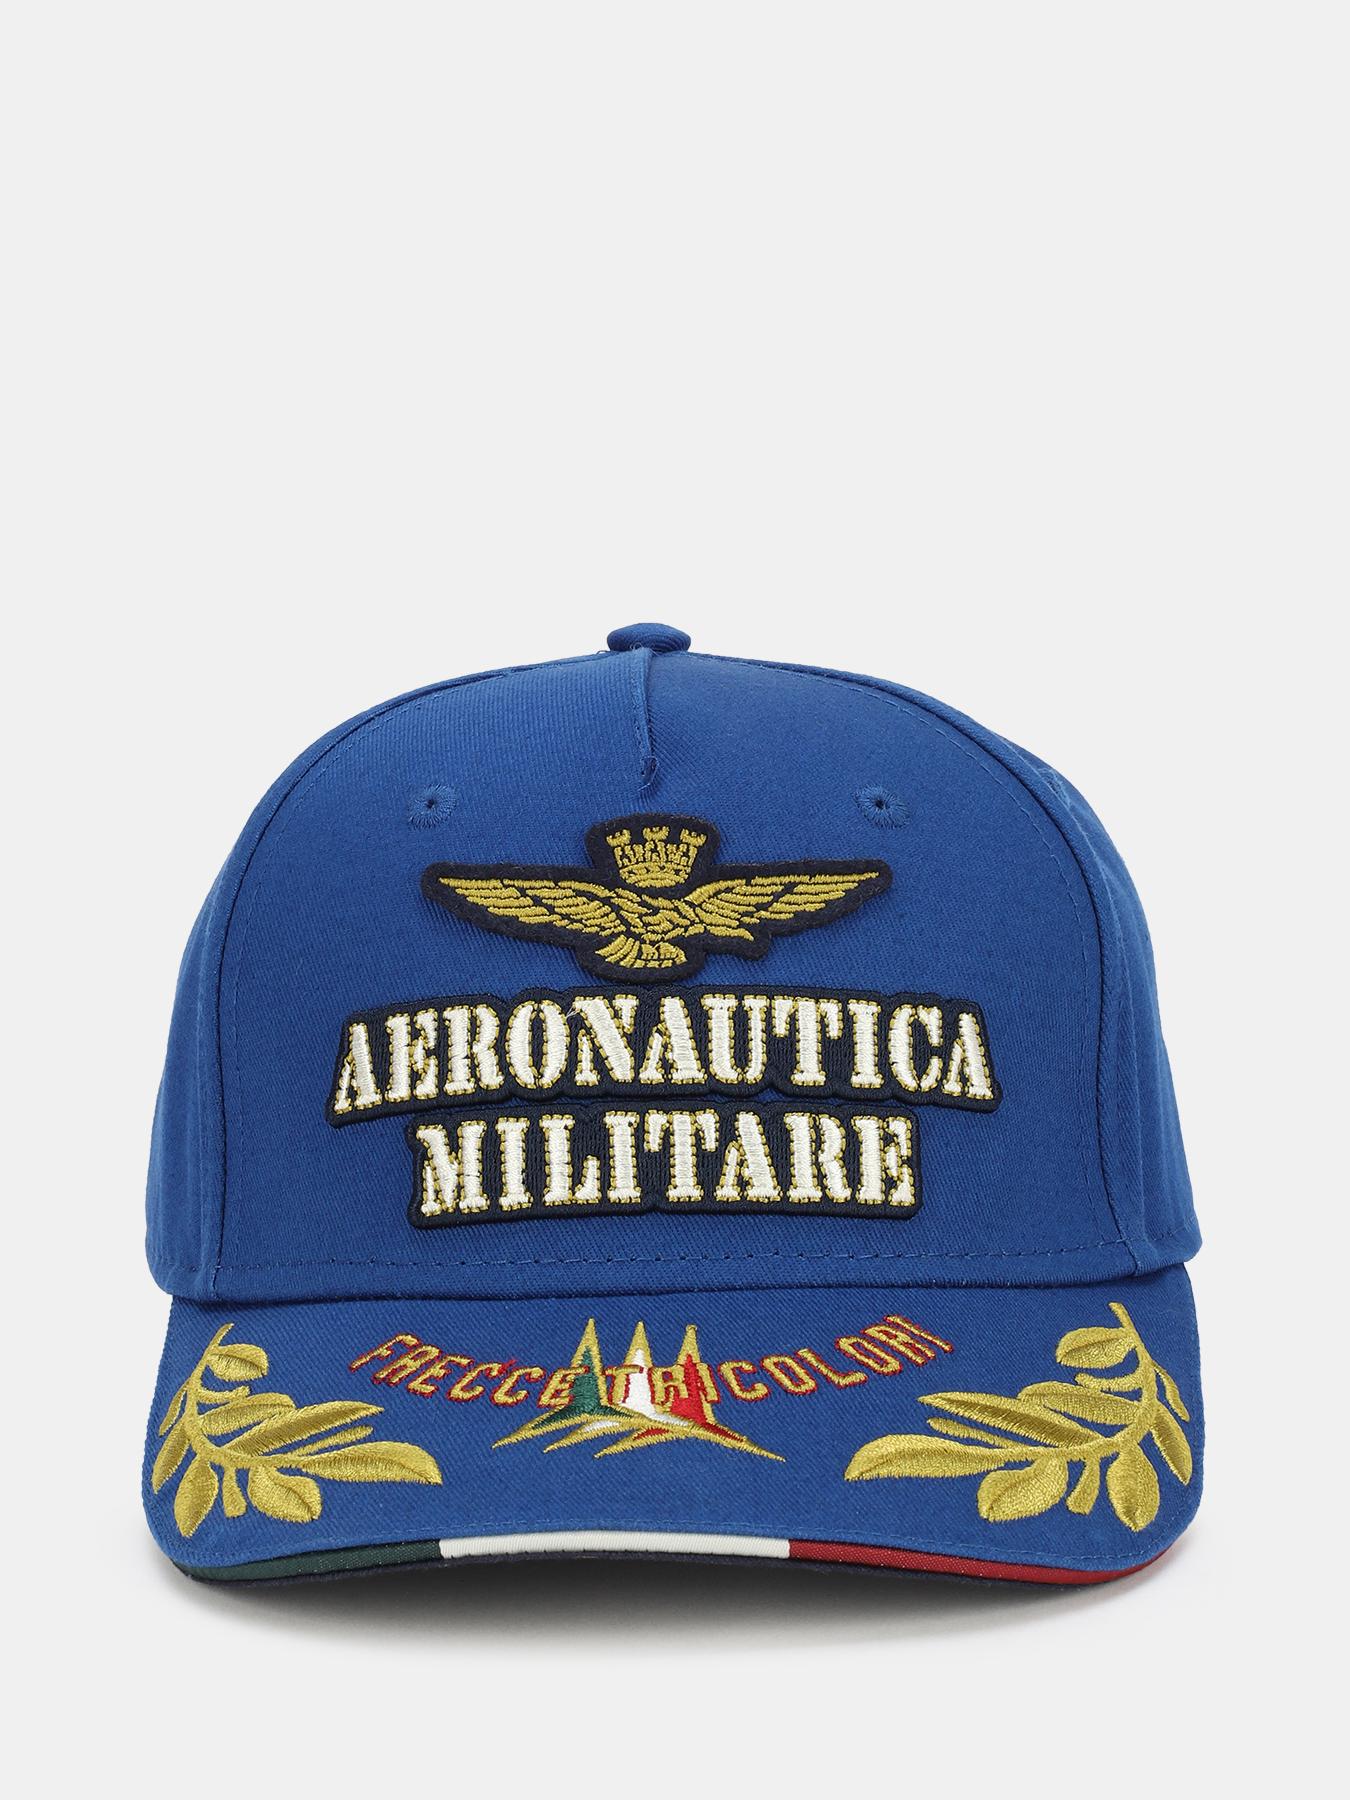 Бейсболка Aeronautica Militare Бейсболка